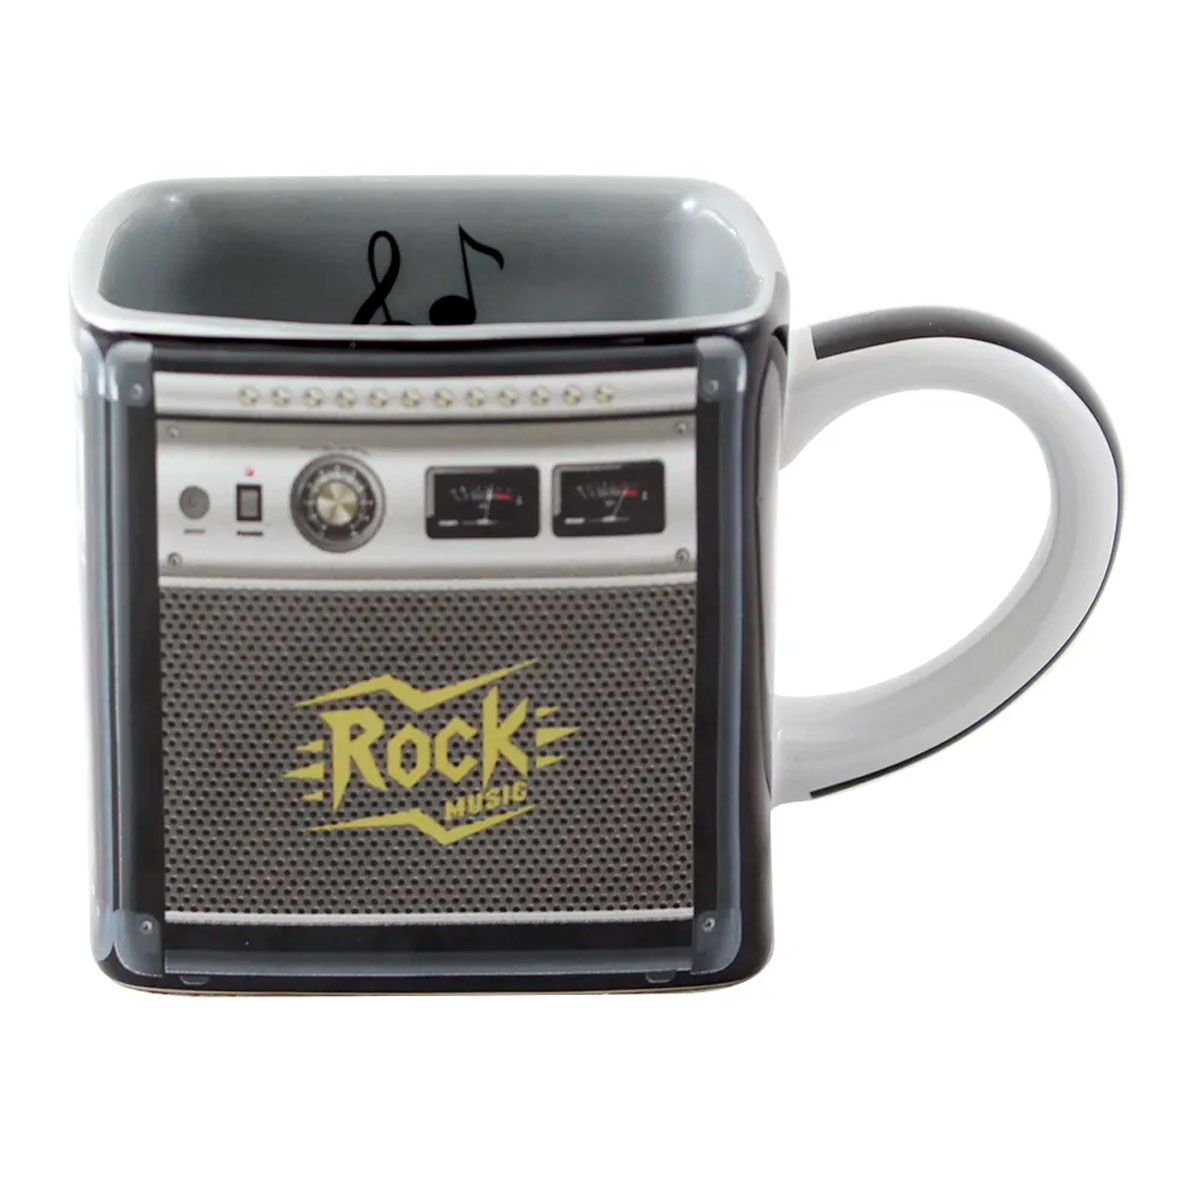 Caneca Quadrada Cubo Amplificador Rock Music